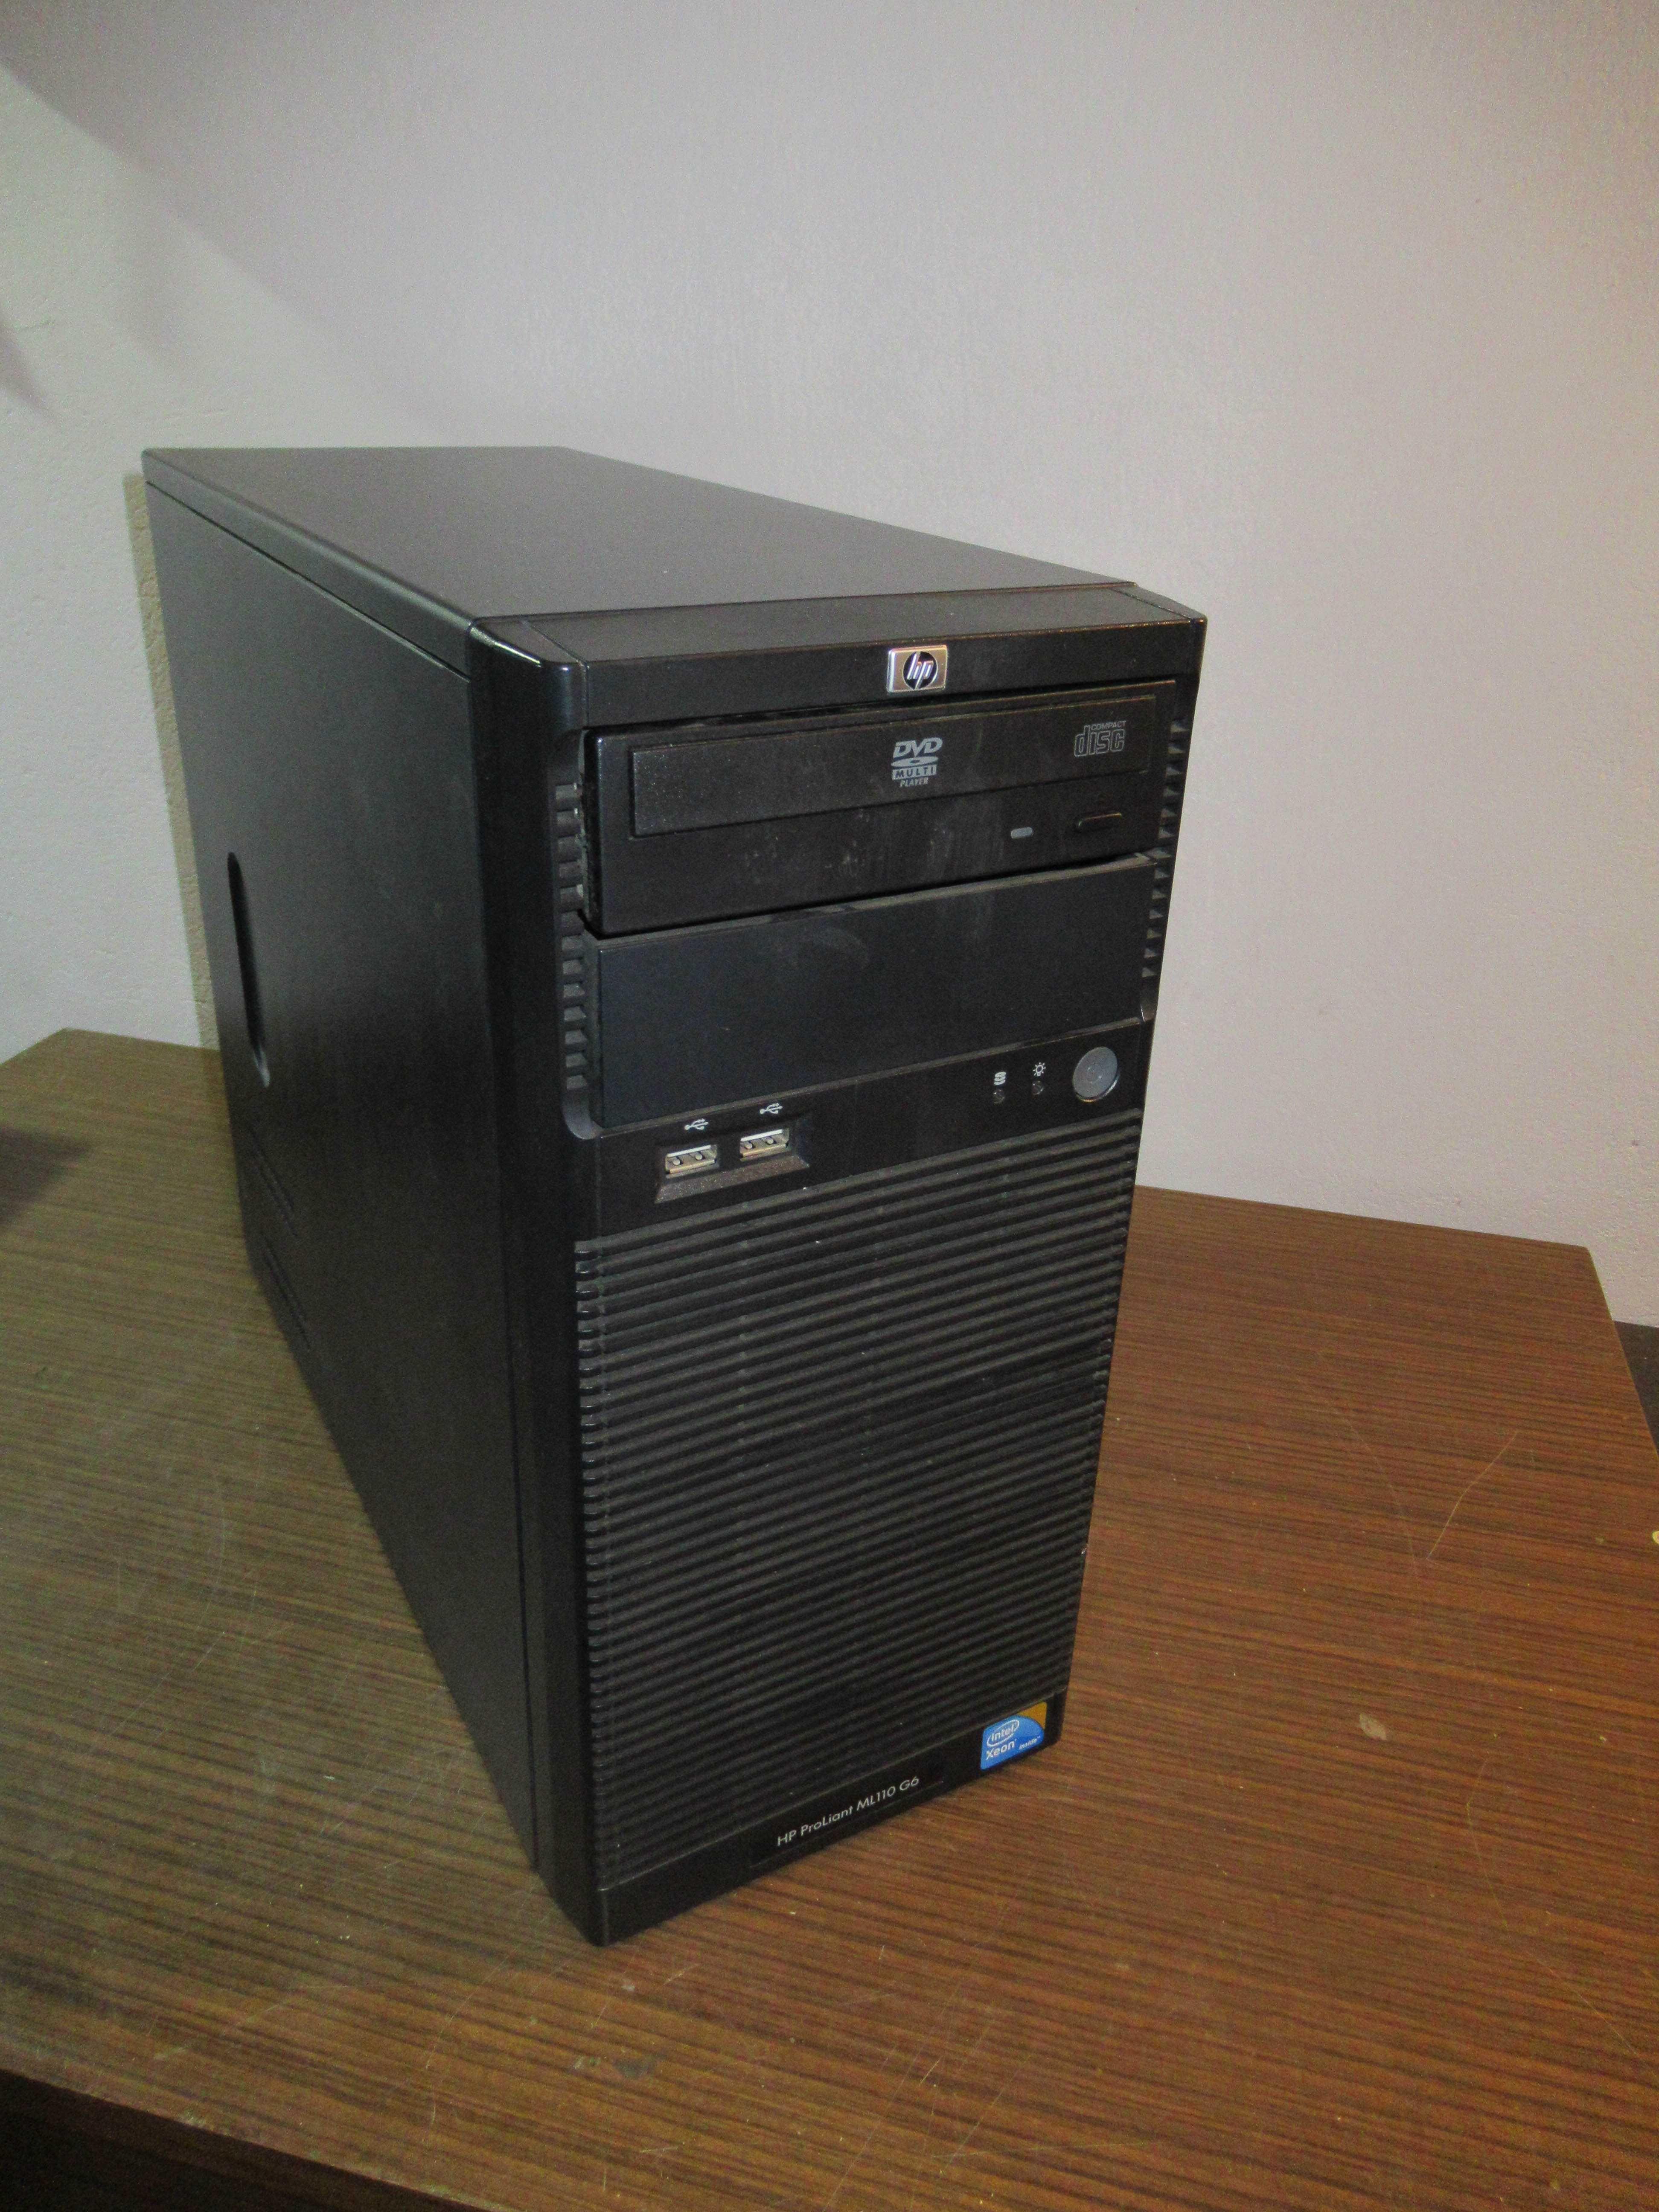 Obudowa HP z oryginalnym zasilaczem + Napęd DVD SATA